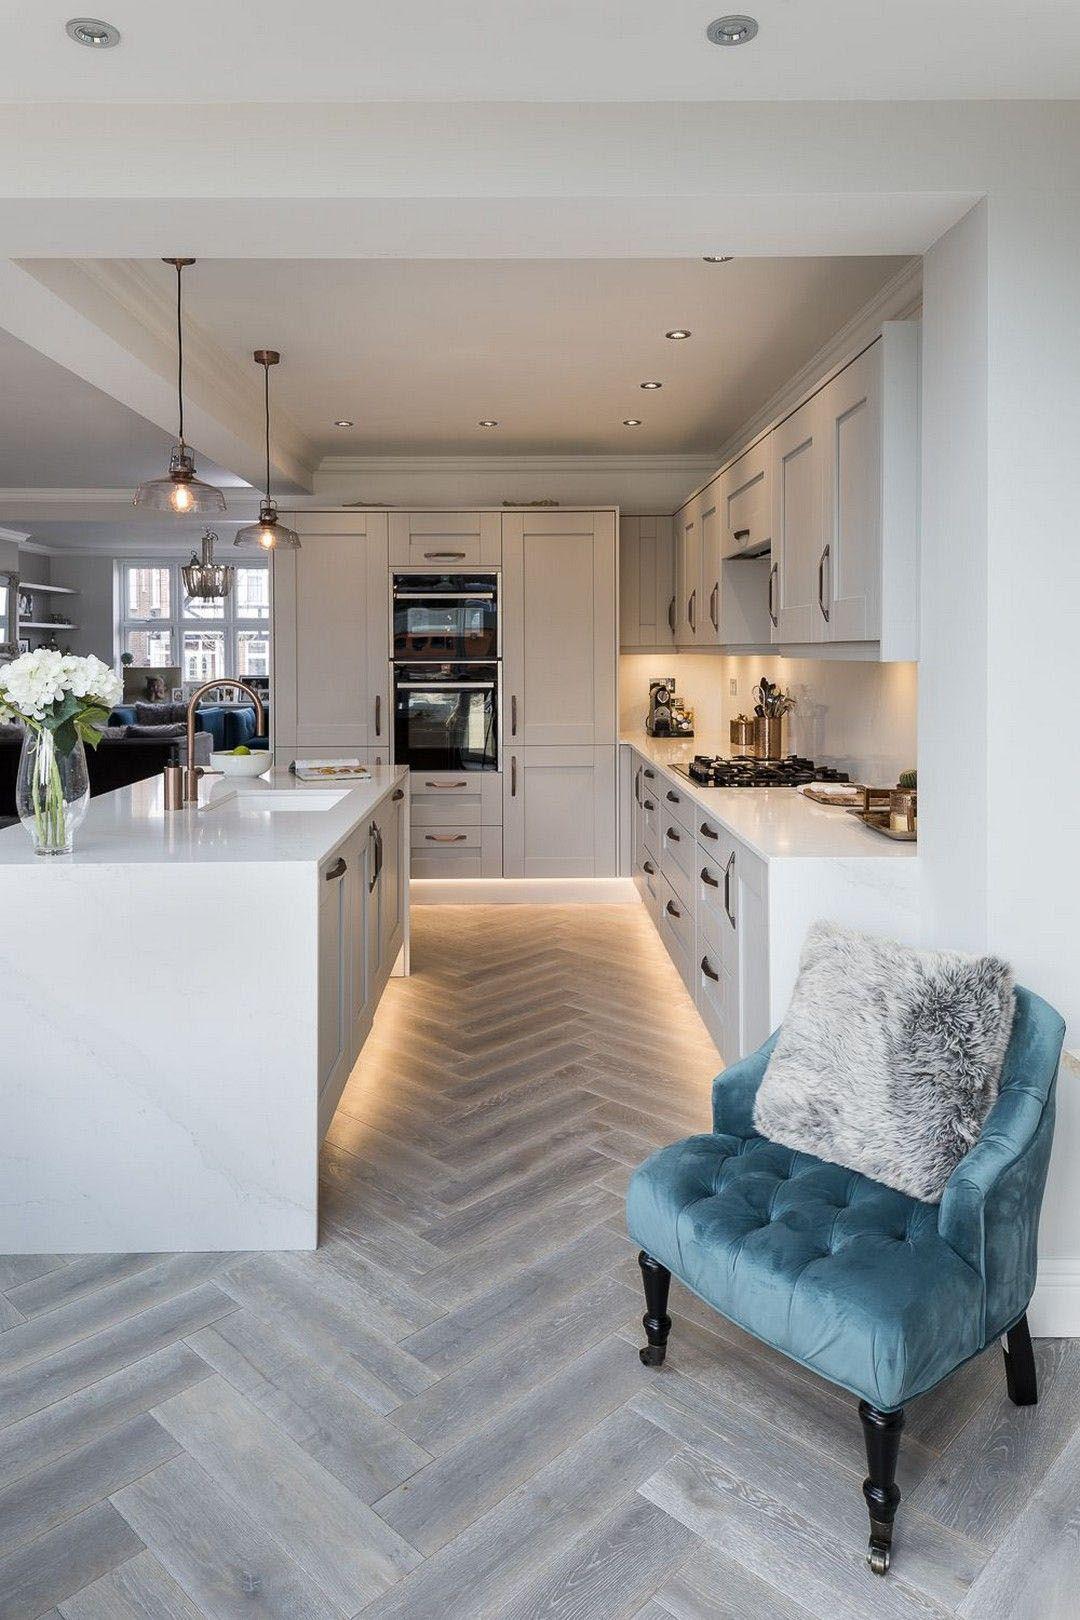 Unique kitchen flooring ideas tile for your cozy home in